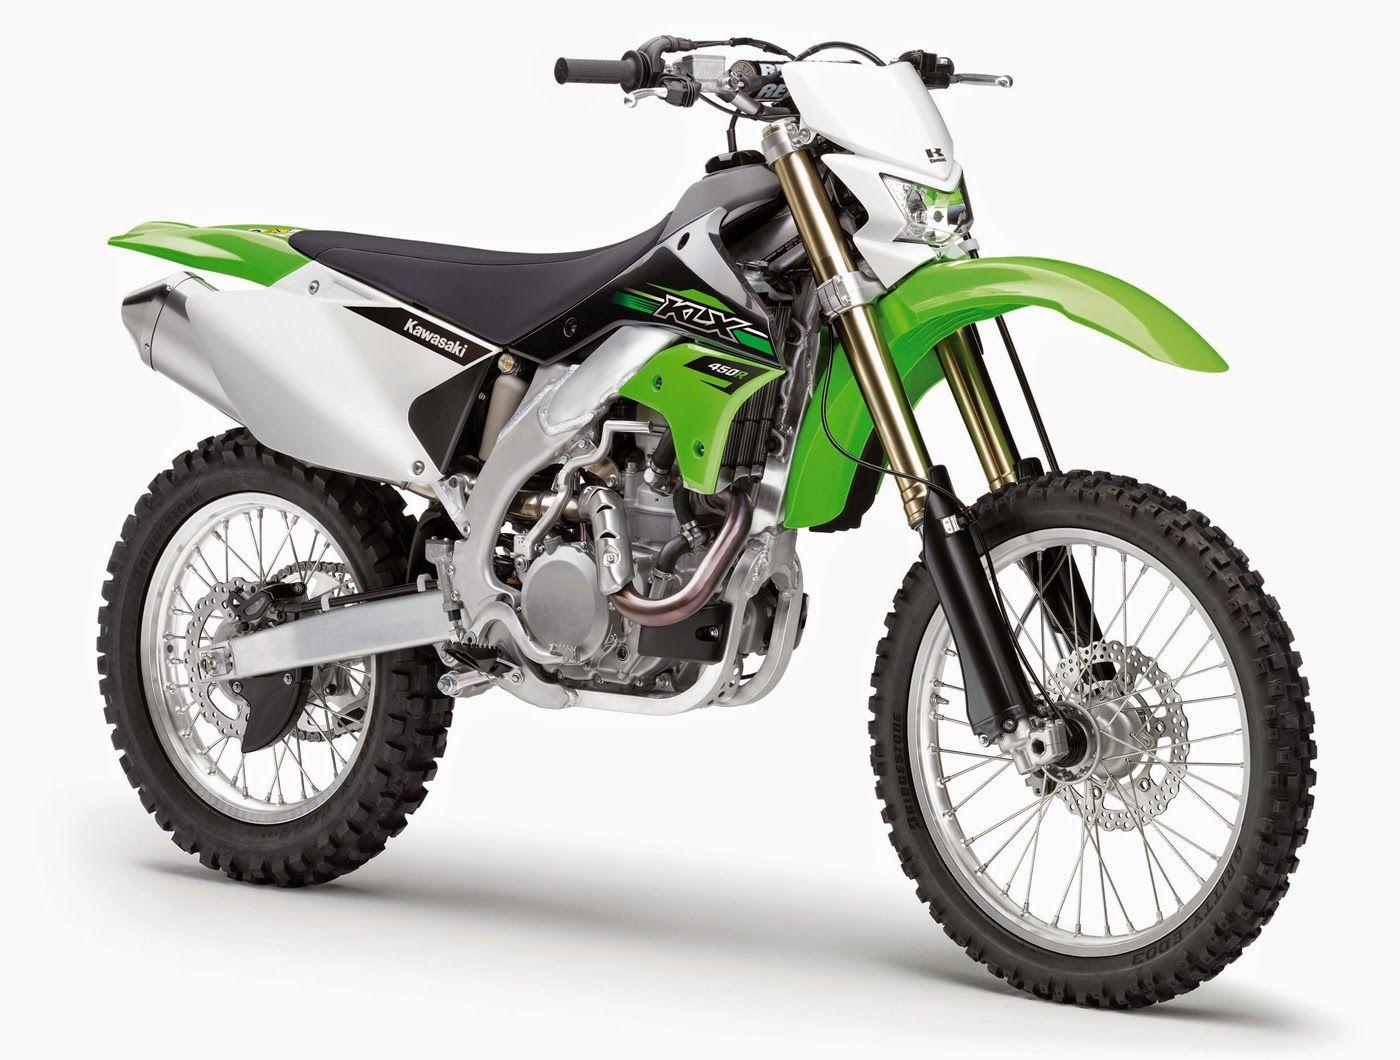 Kawasaki Klx L 2015 Repair Manuals Kawasaki Dirt Bikes Dirt Bike